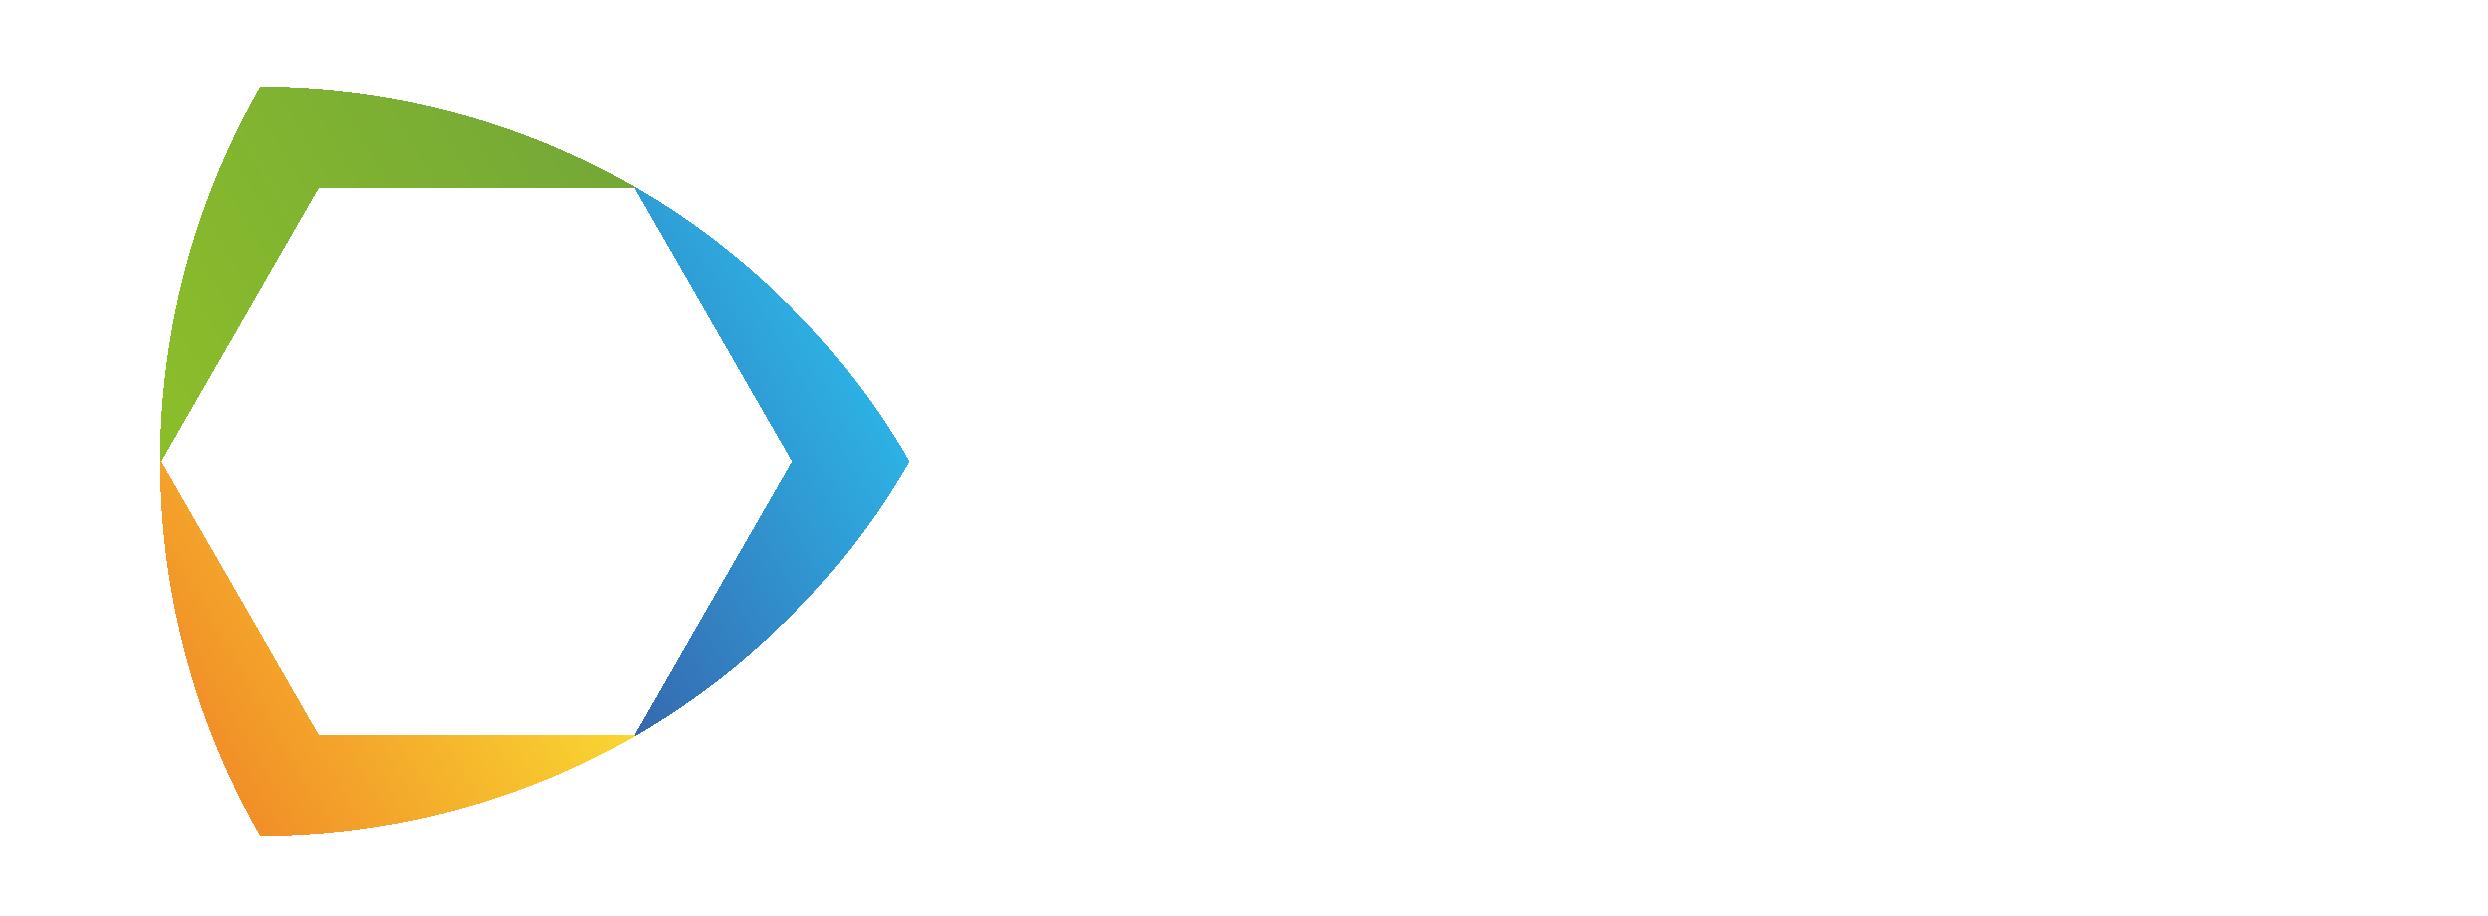 Sustaihub永訊智庫 - Logo